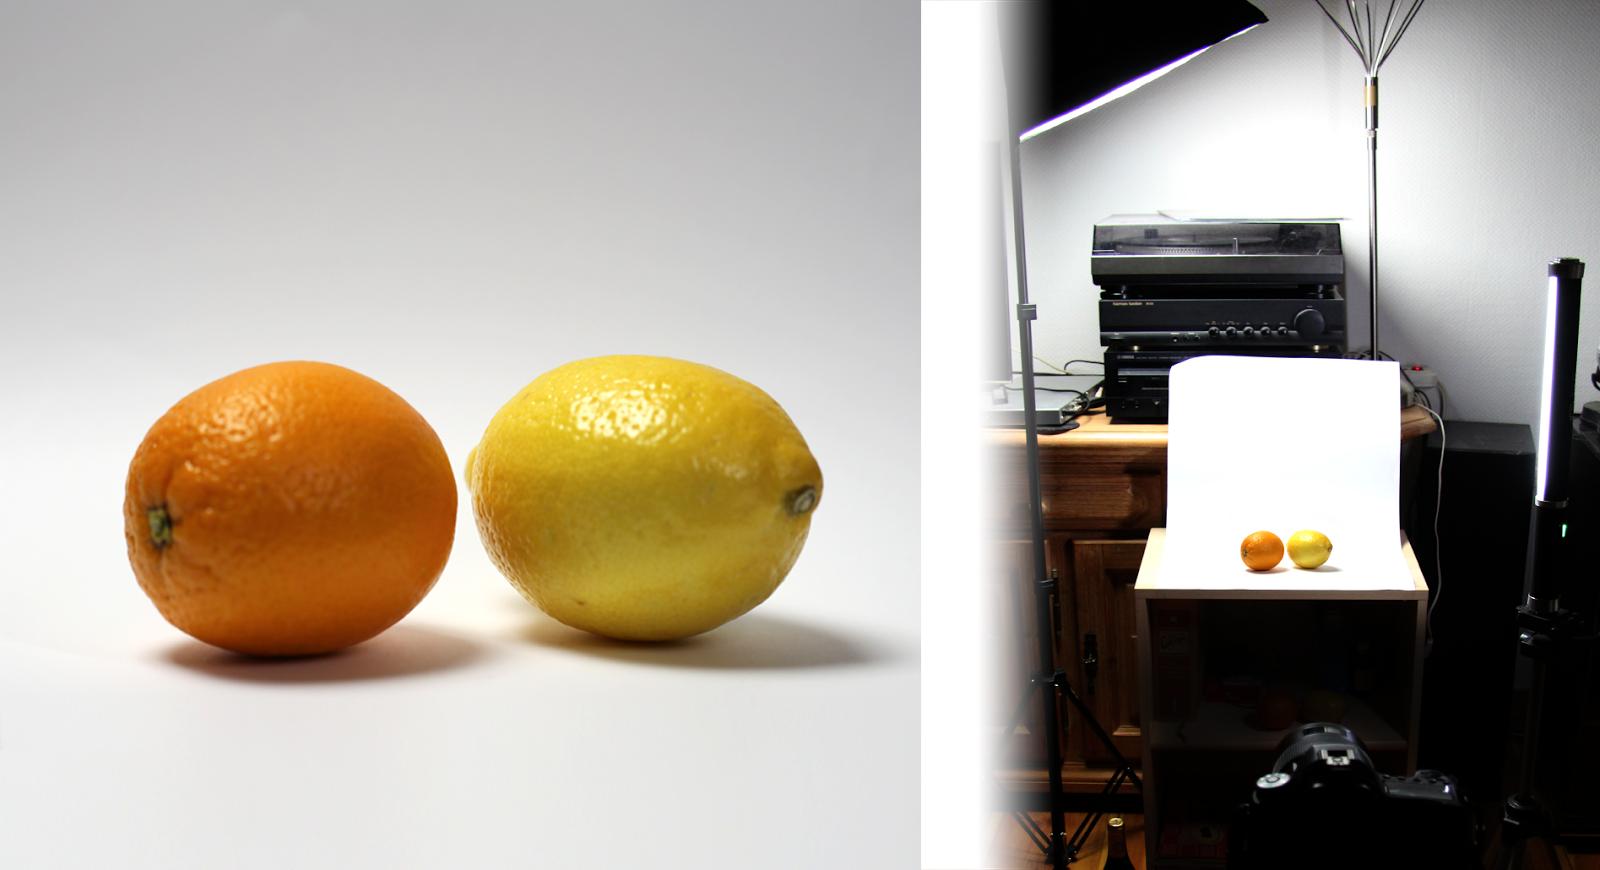 5 licht tipps f r professionelle objektfotografie zoomyrentals blog. Black Bedroom Furniture Sets. Home Design Ideas